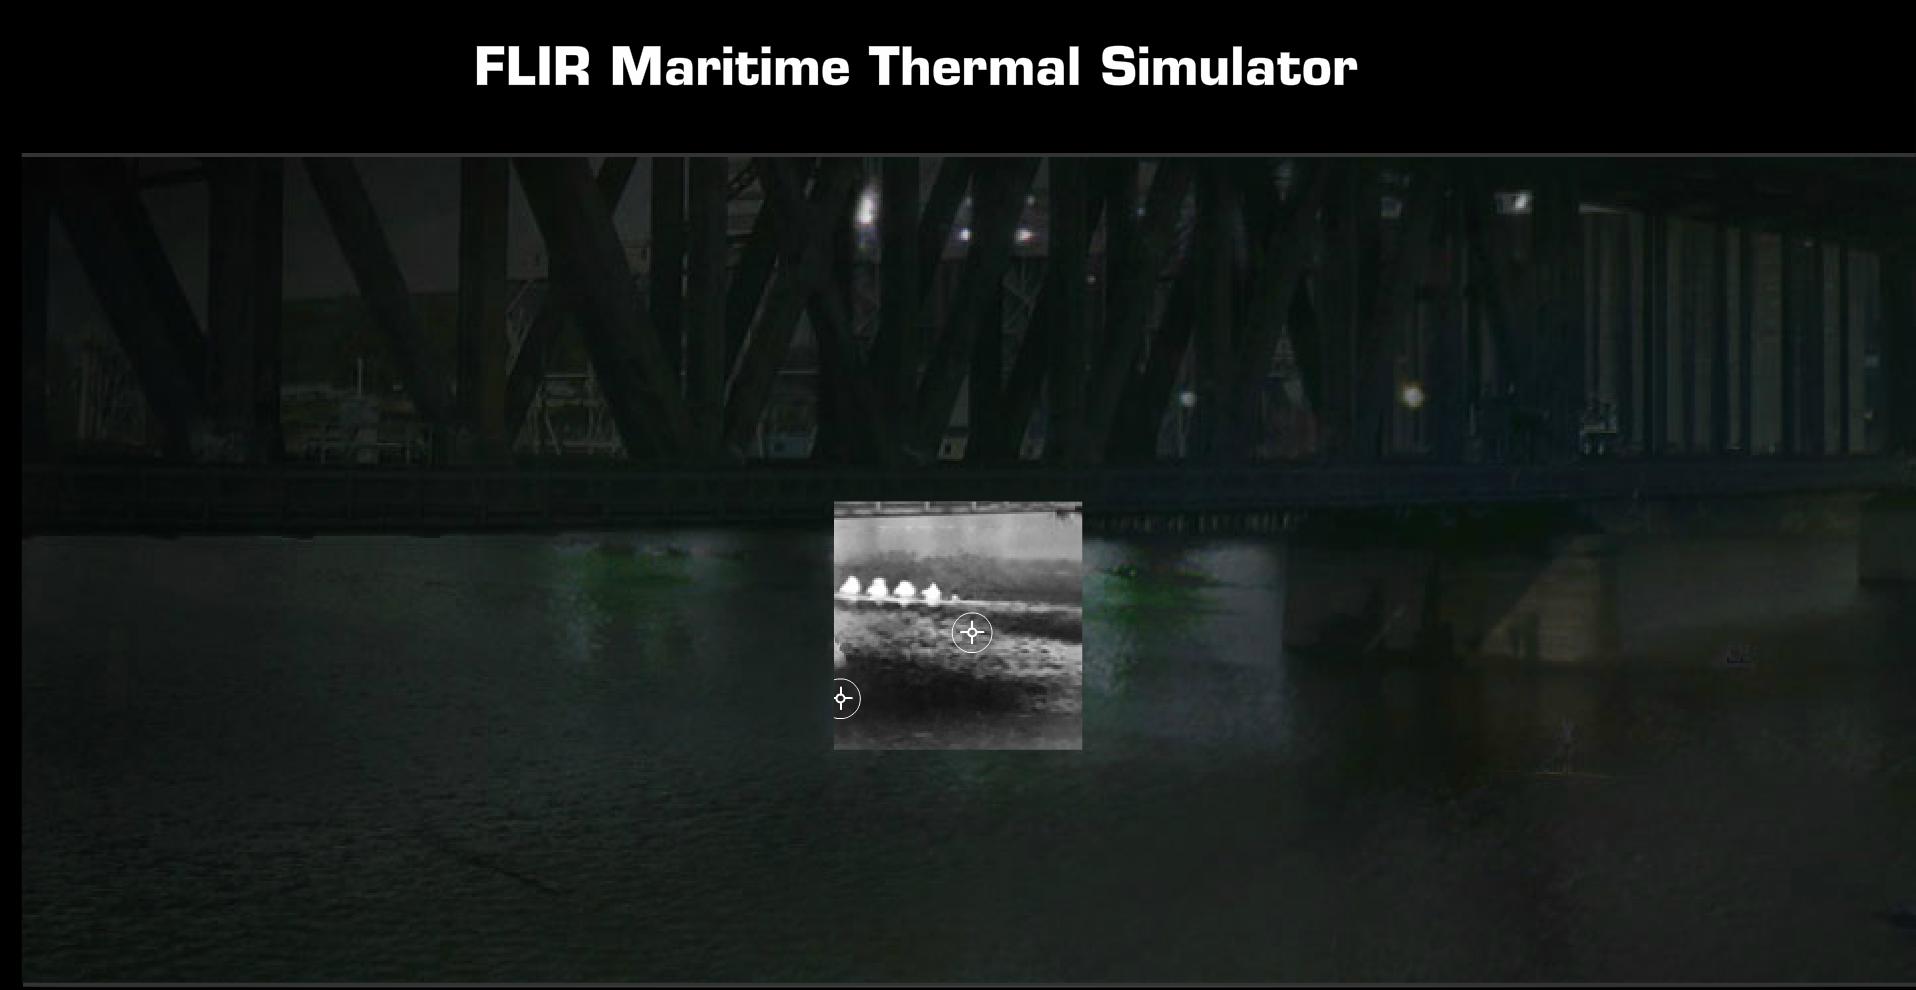 FLIR Thermal Simulator | Marine Special Products